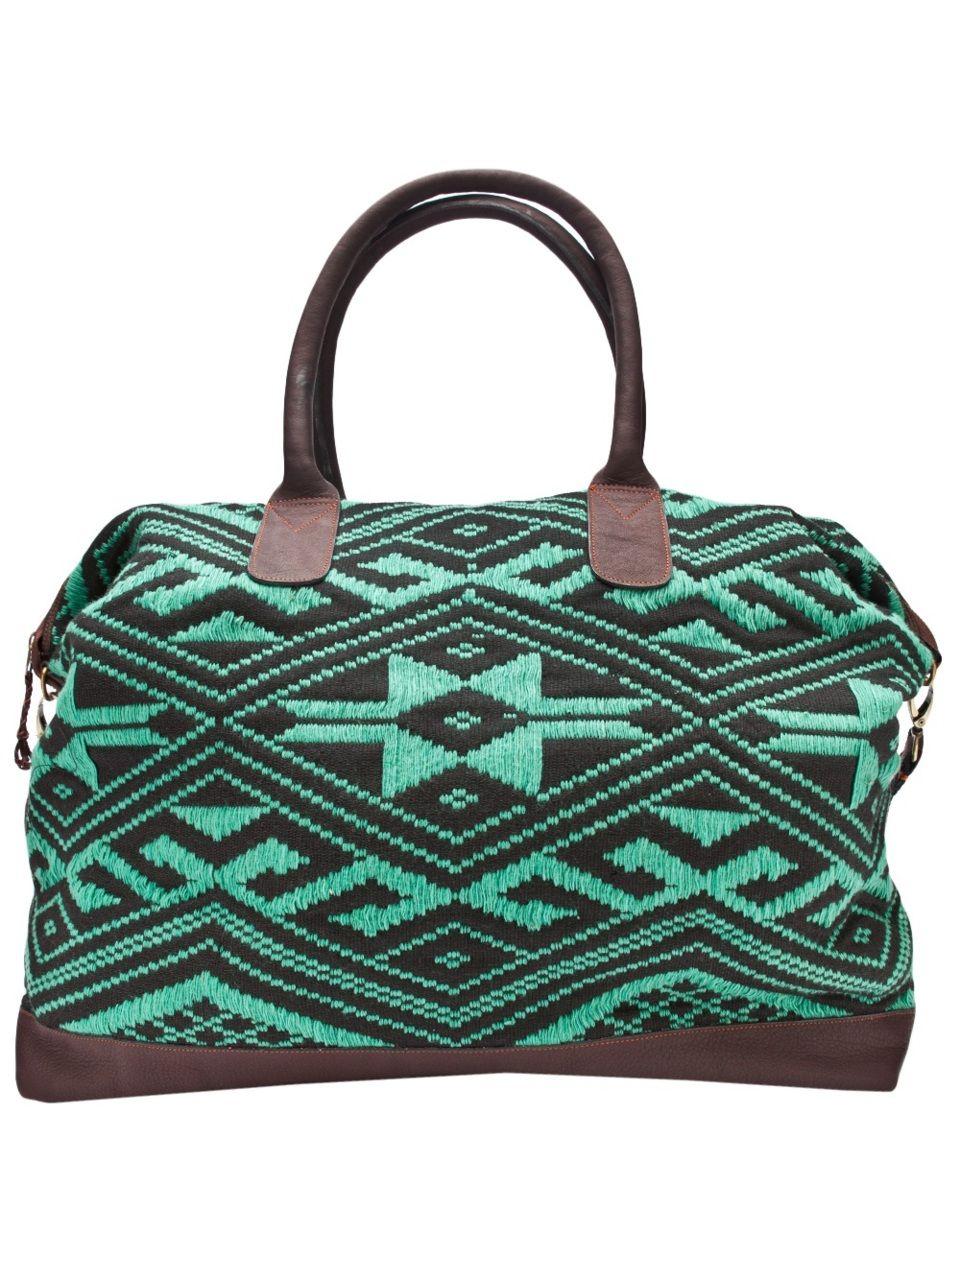 teal patterned duffel